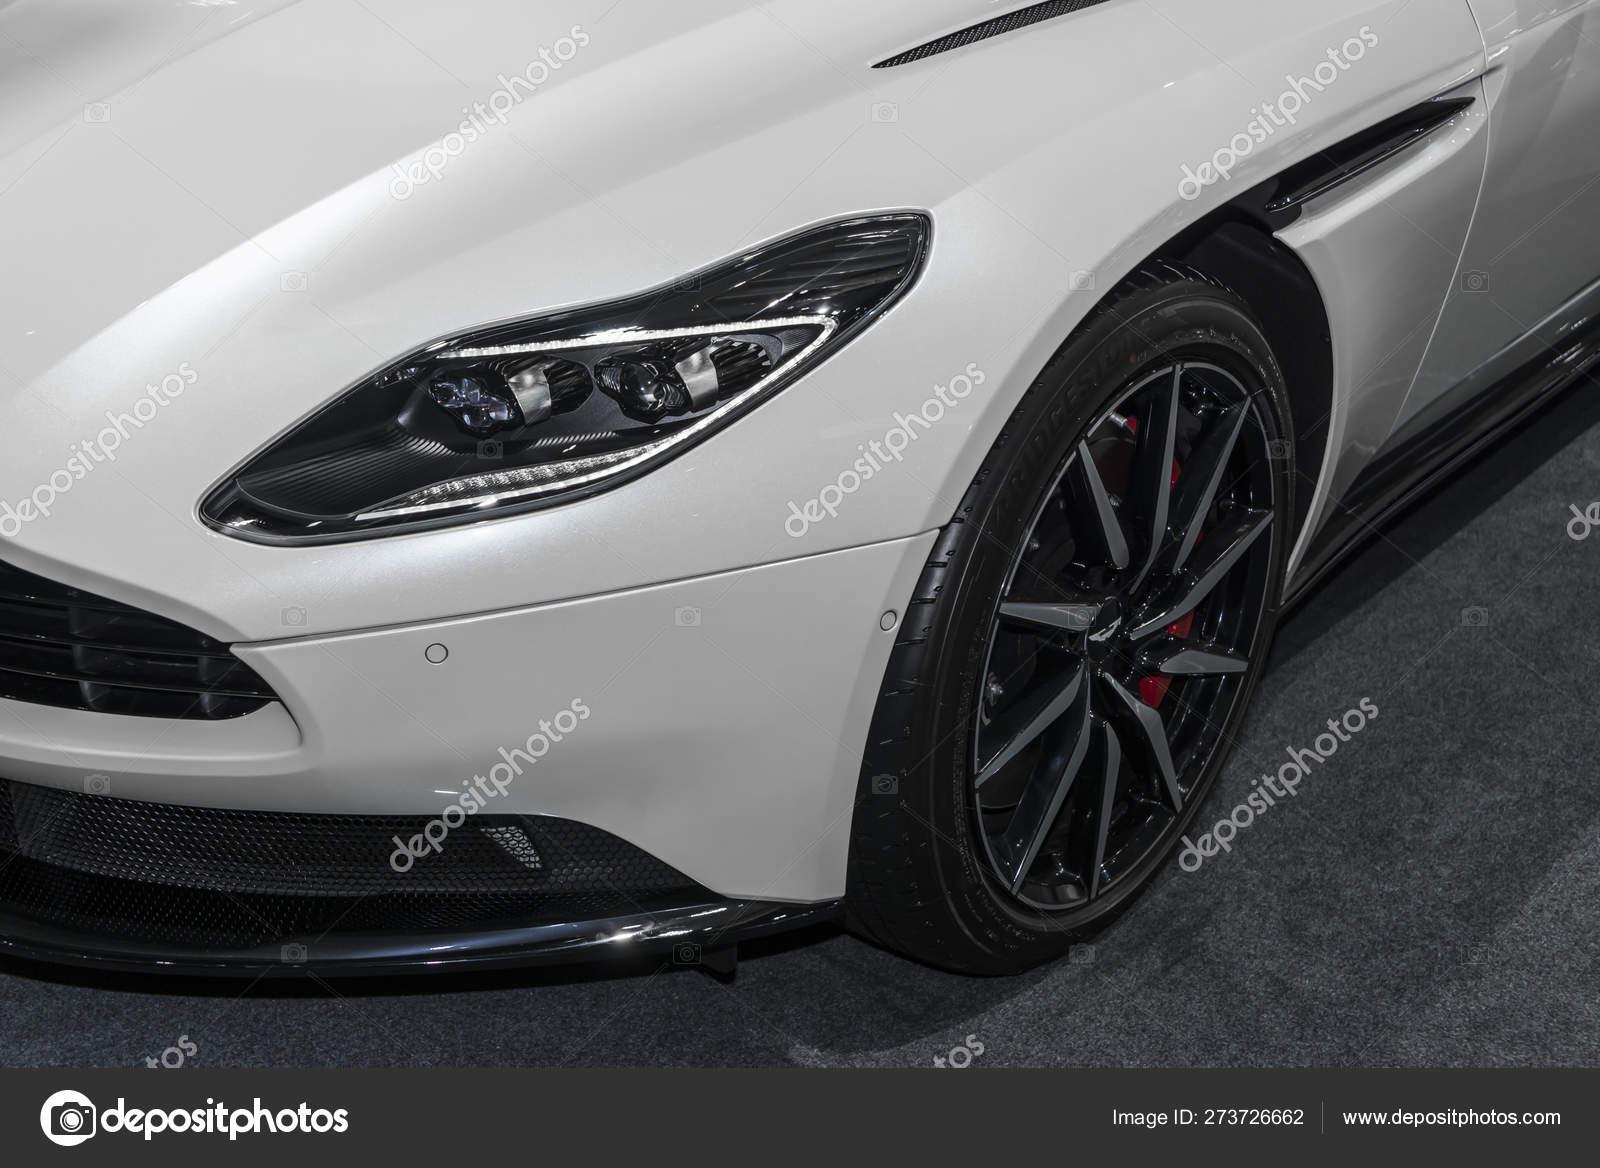 Bangkok Thailand November 2018 Aston Martin Db11 Turbo Coupe White Stock Editorial Photo Pomphotothailand Gmail Com 273726662